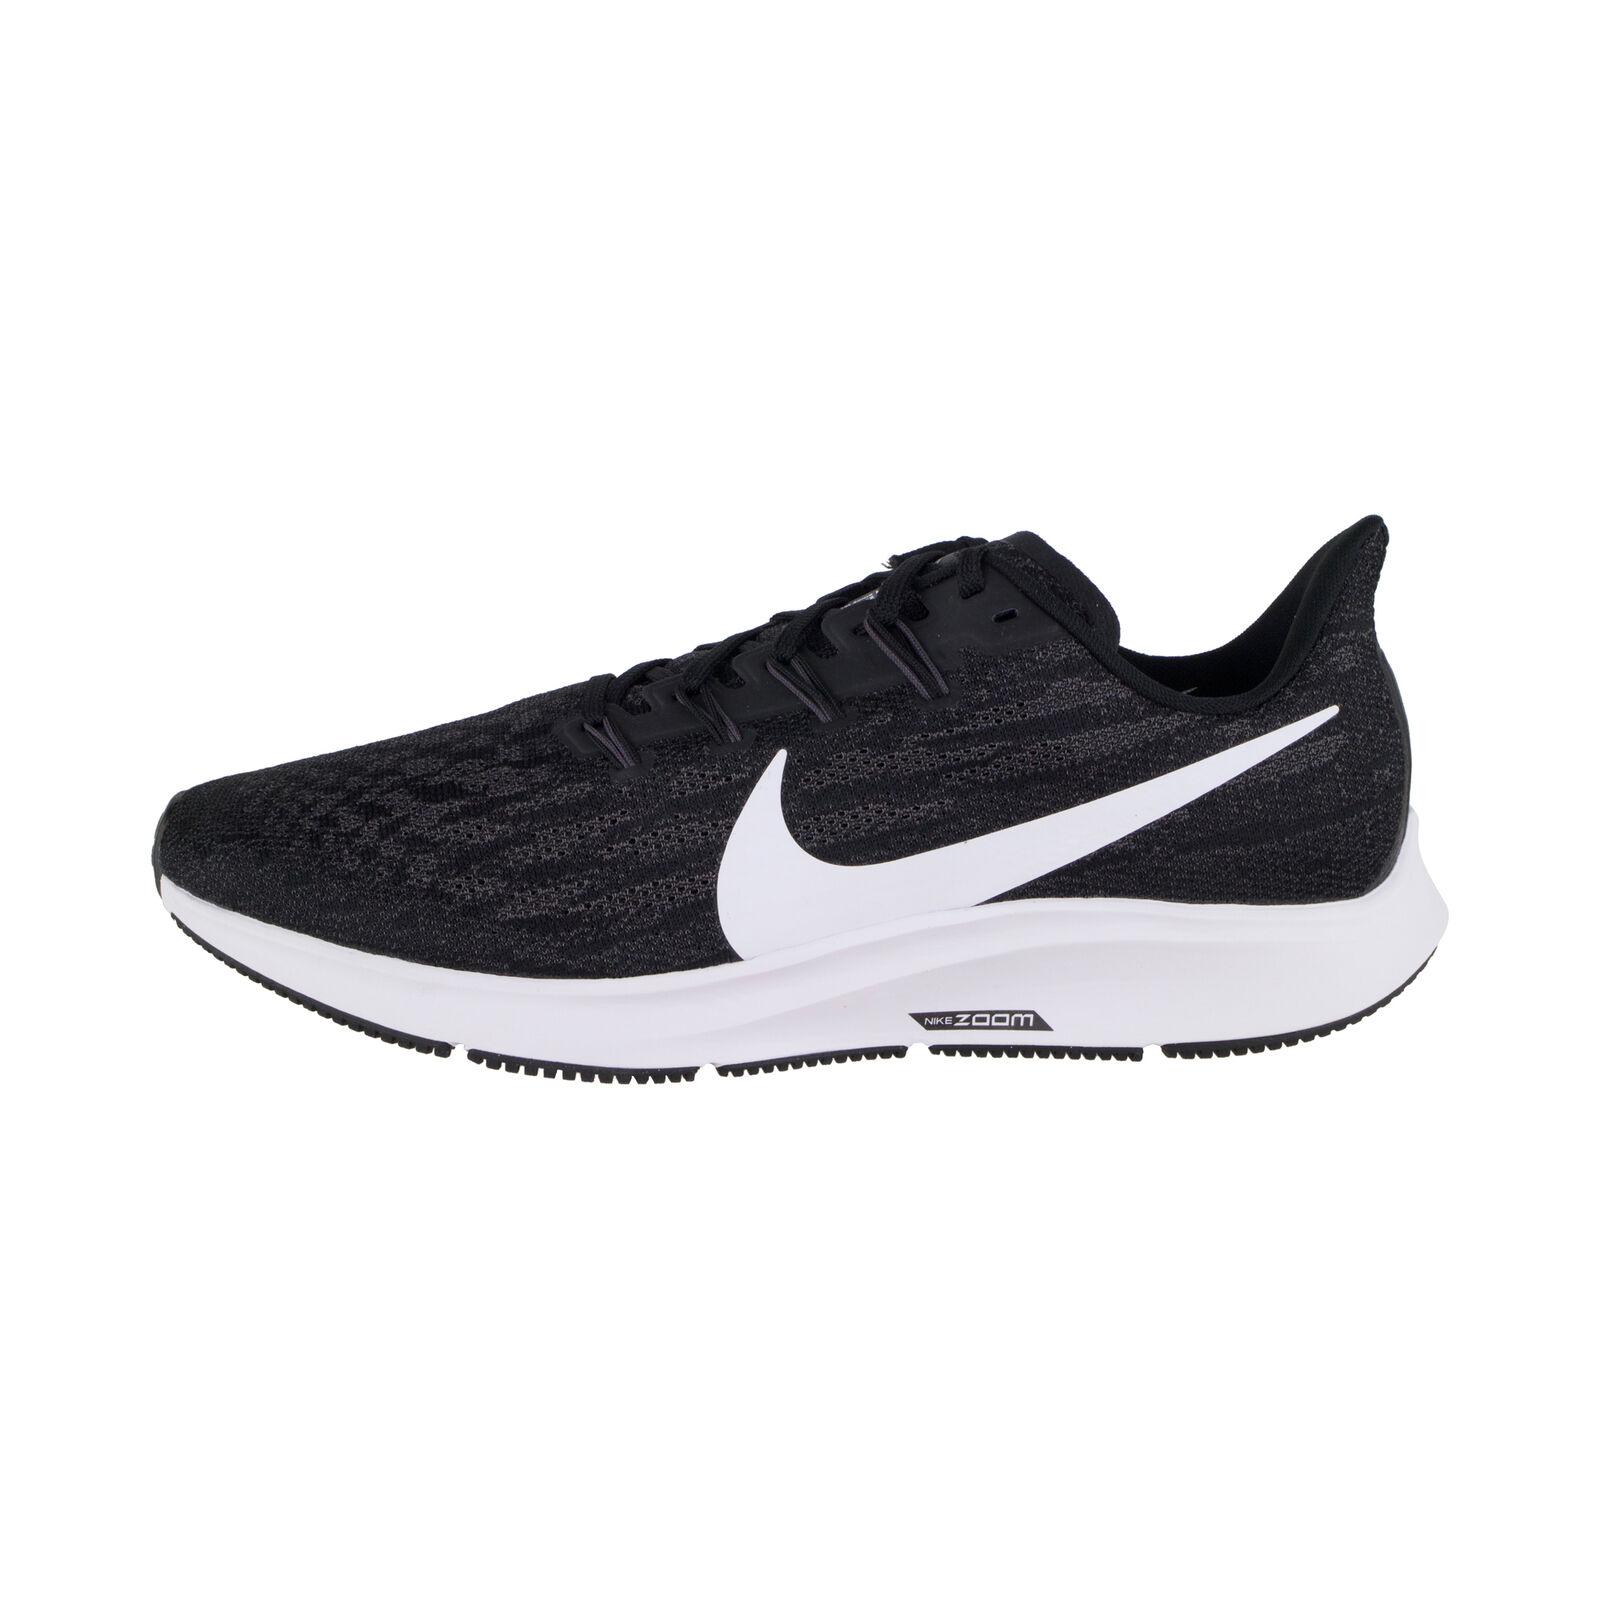 Nike Zoom Fitness SchwarzWeiß Damen Trainingsschuh Style